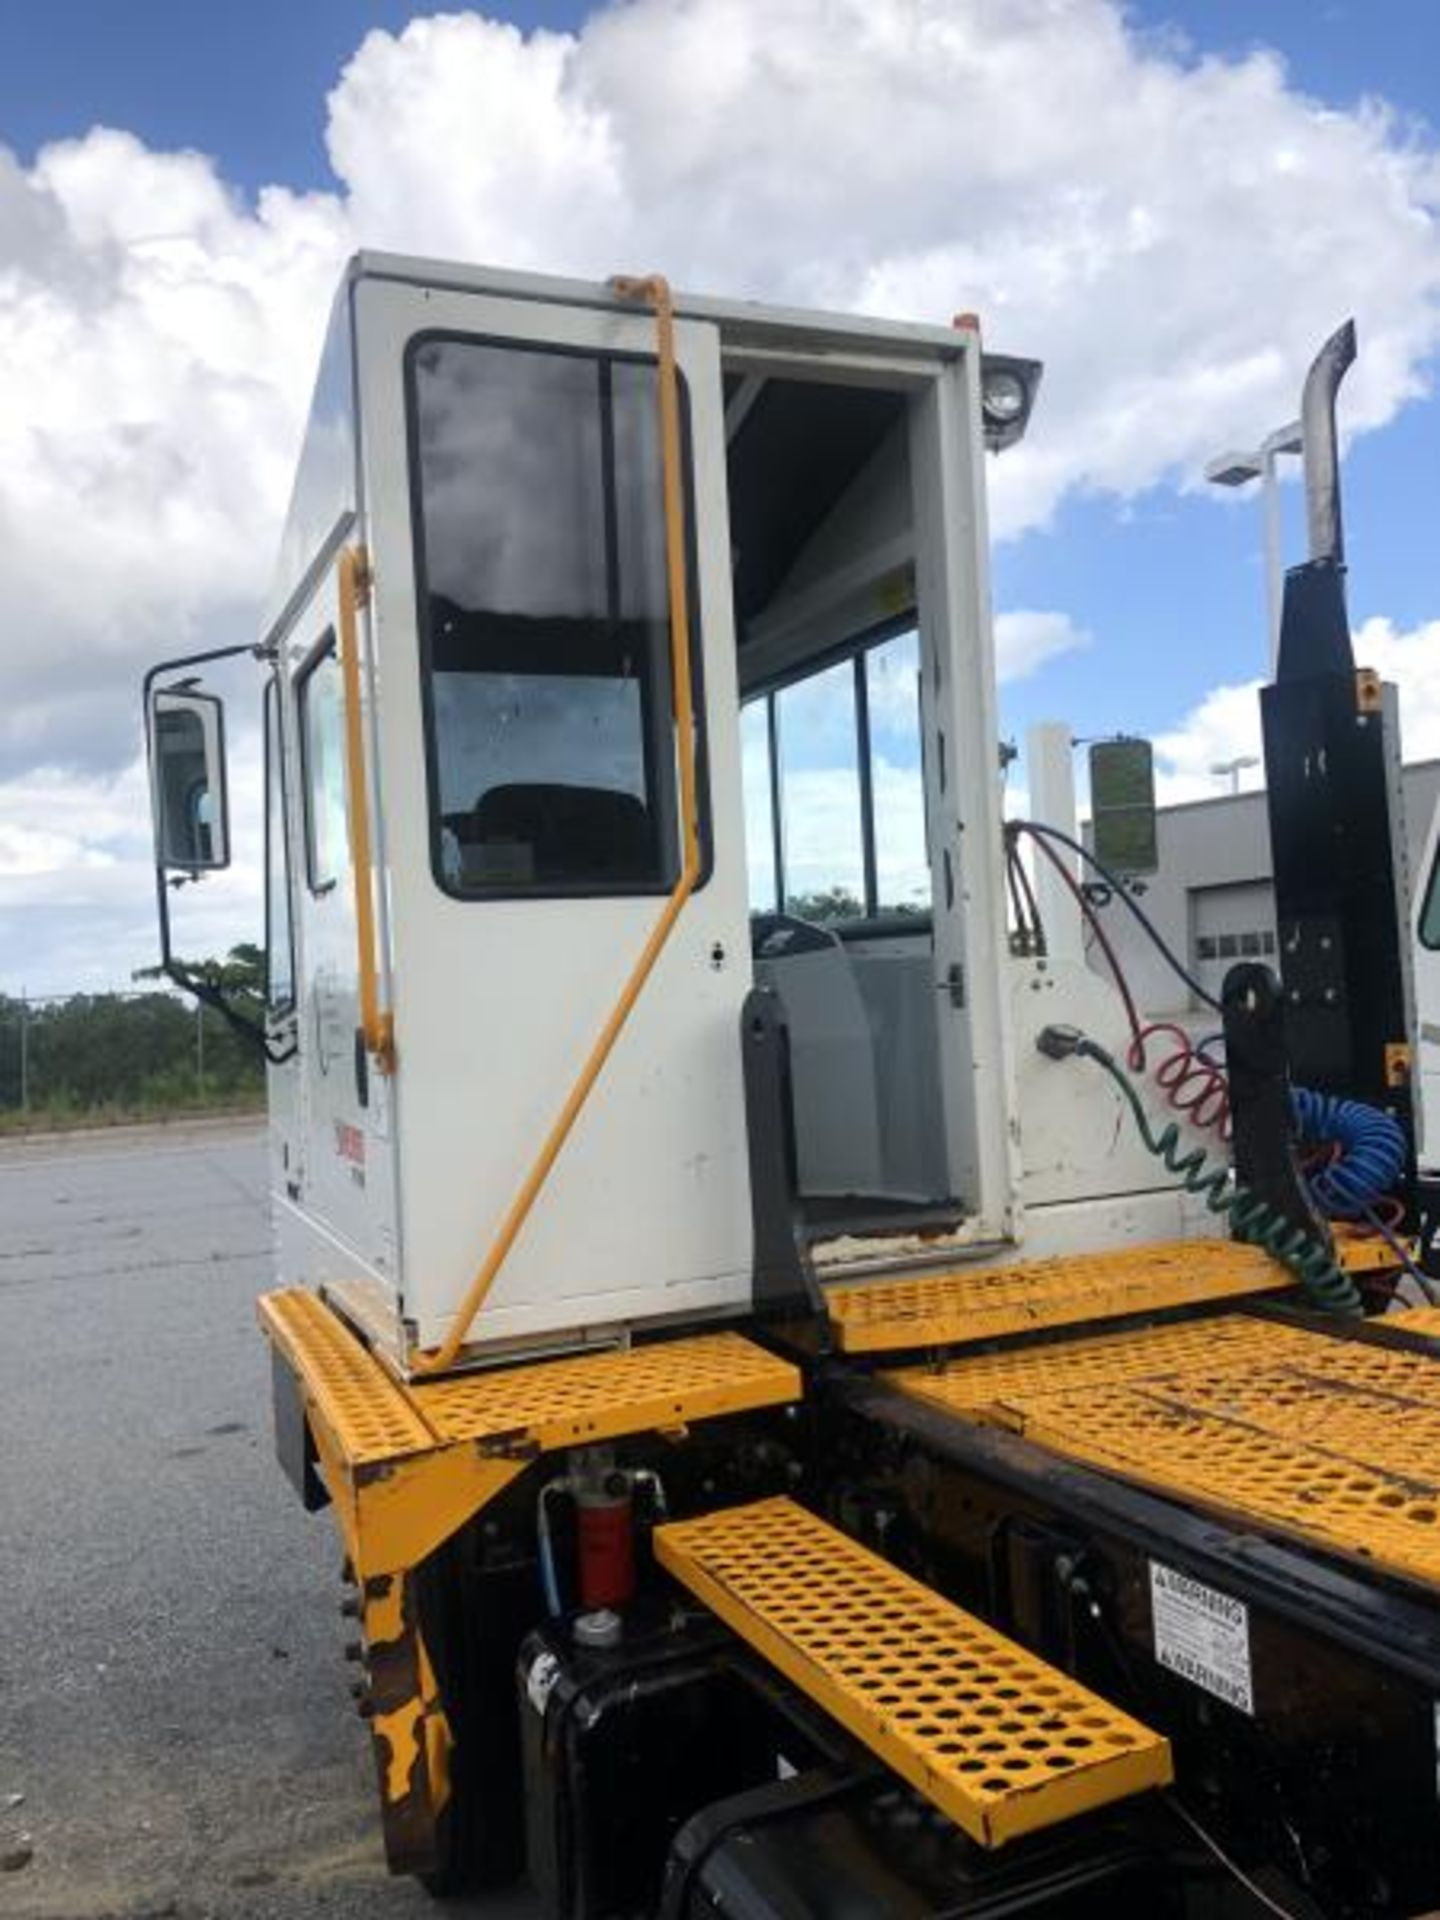 2015 Kalmar Ottawa 4x2 Yard Truck , SN: 338845 2,600.5 Hours, 185 Miles - Image 8 of 27